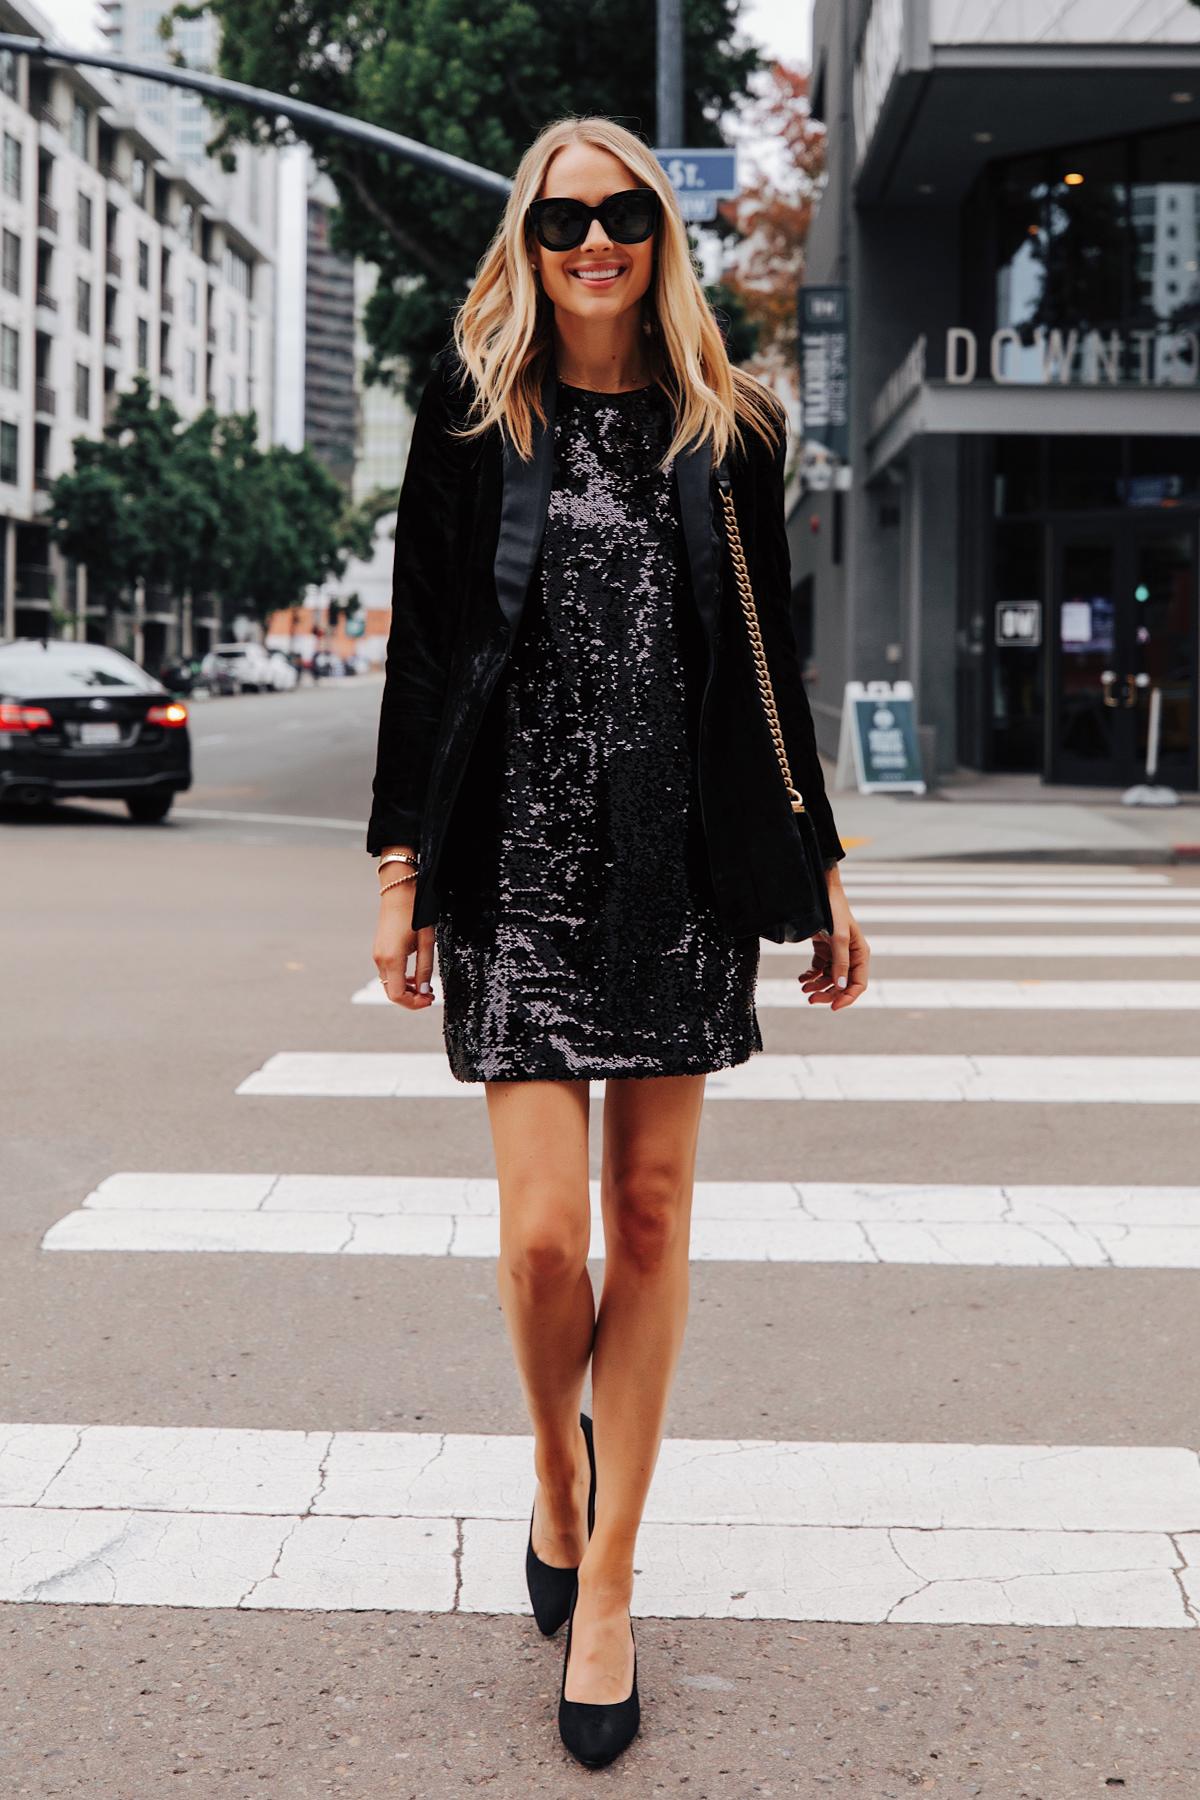 Fashion Jackson Wearing Walmart Black Velvet Blazer Black Sequin Dress Black Pumps